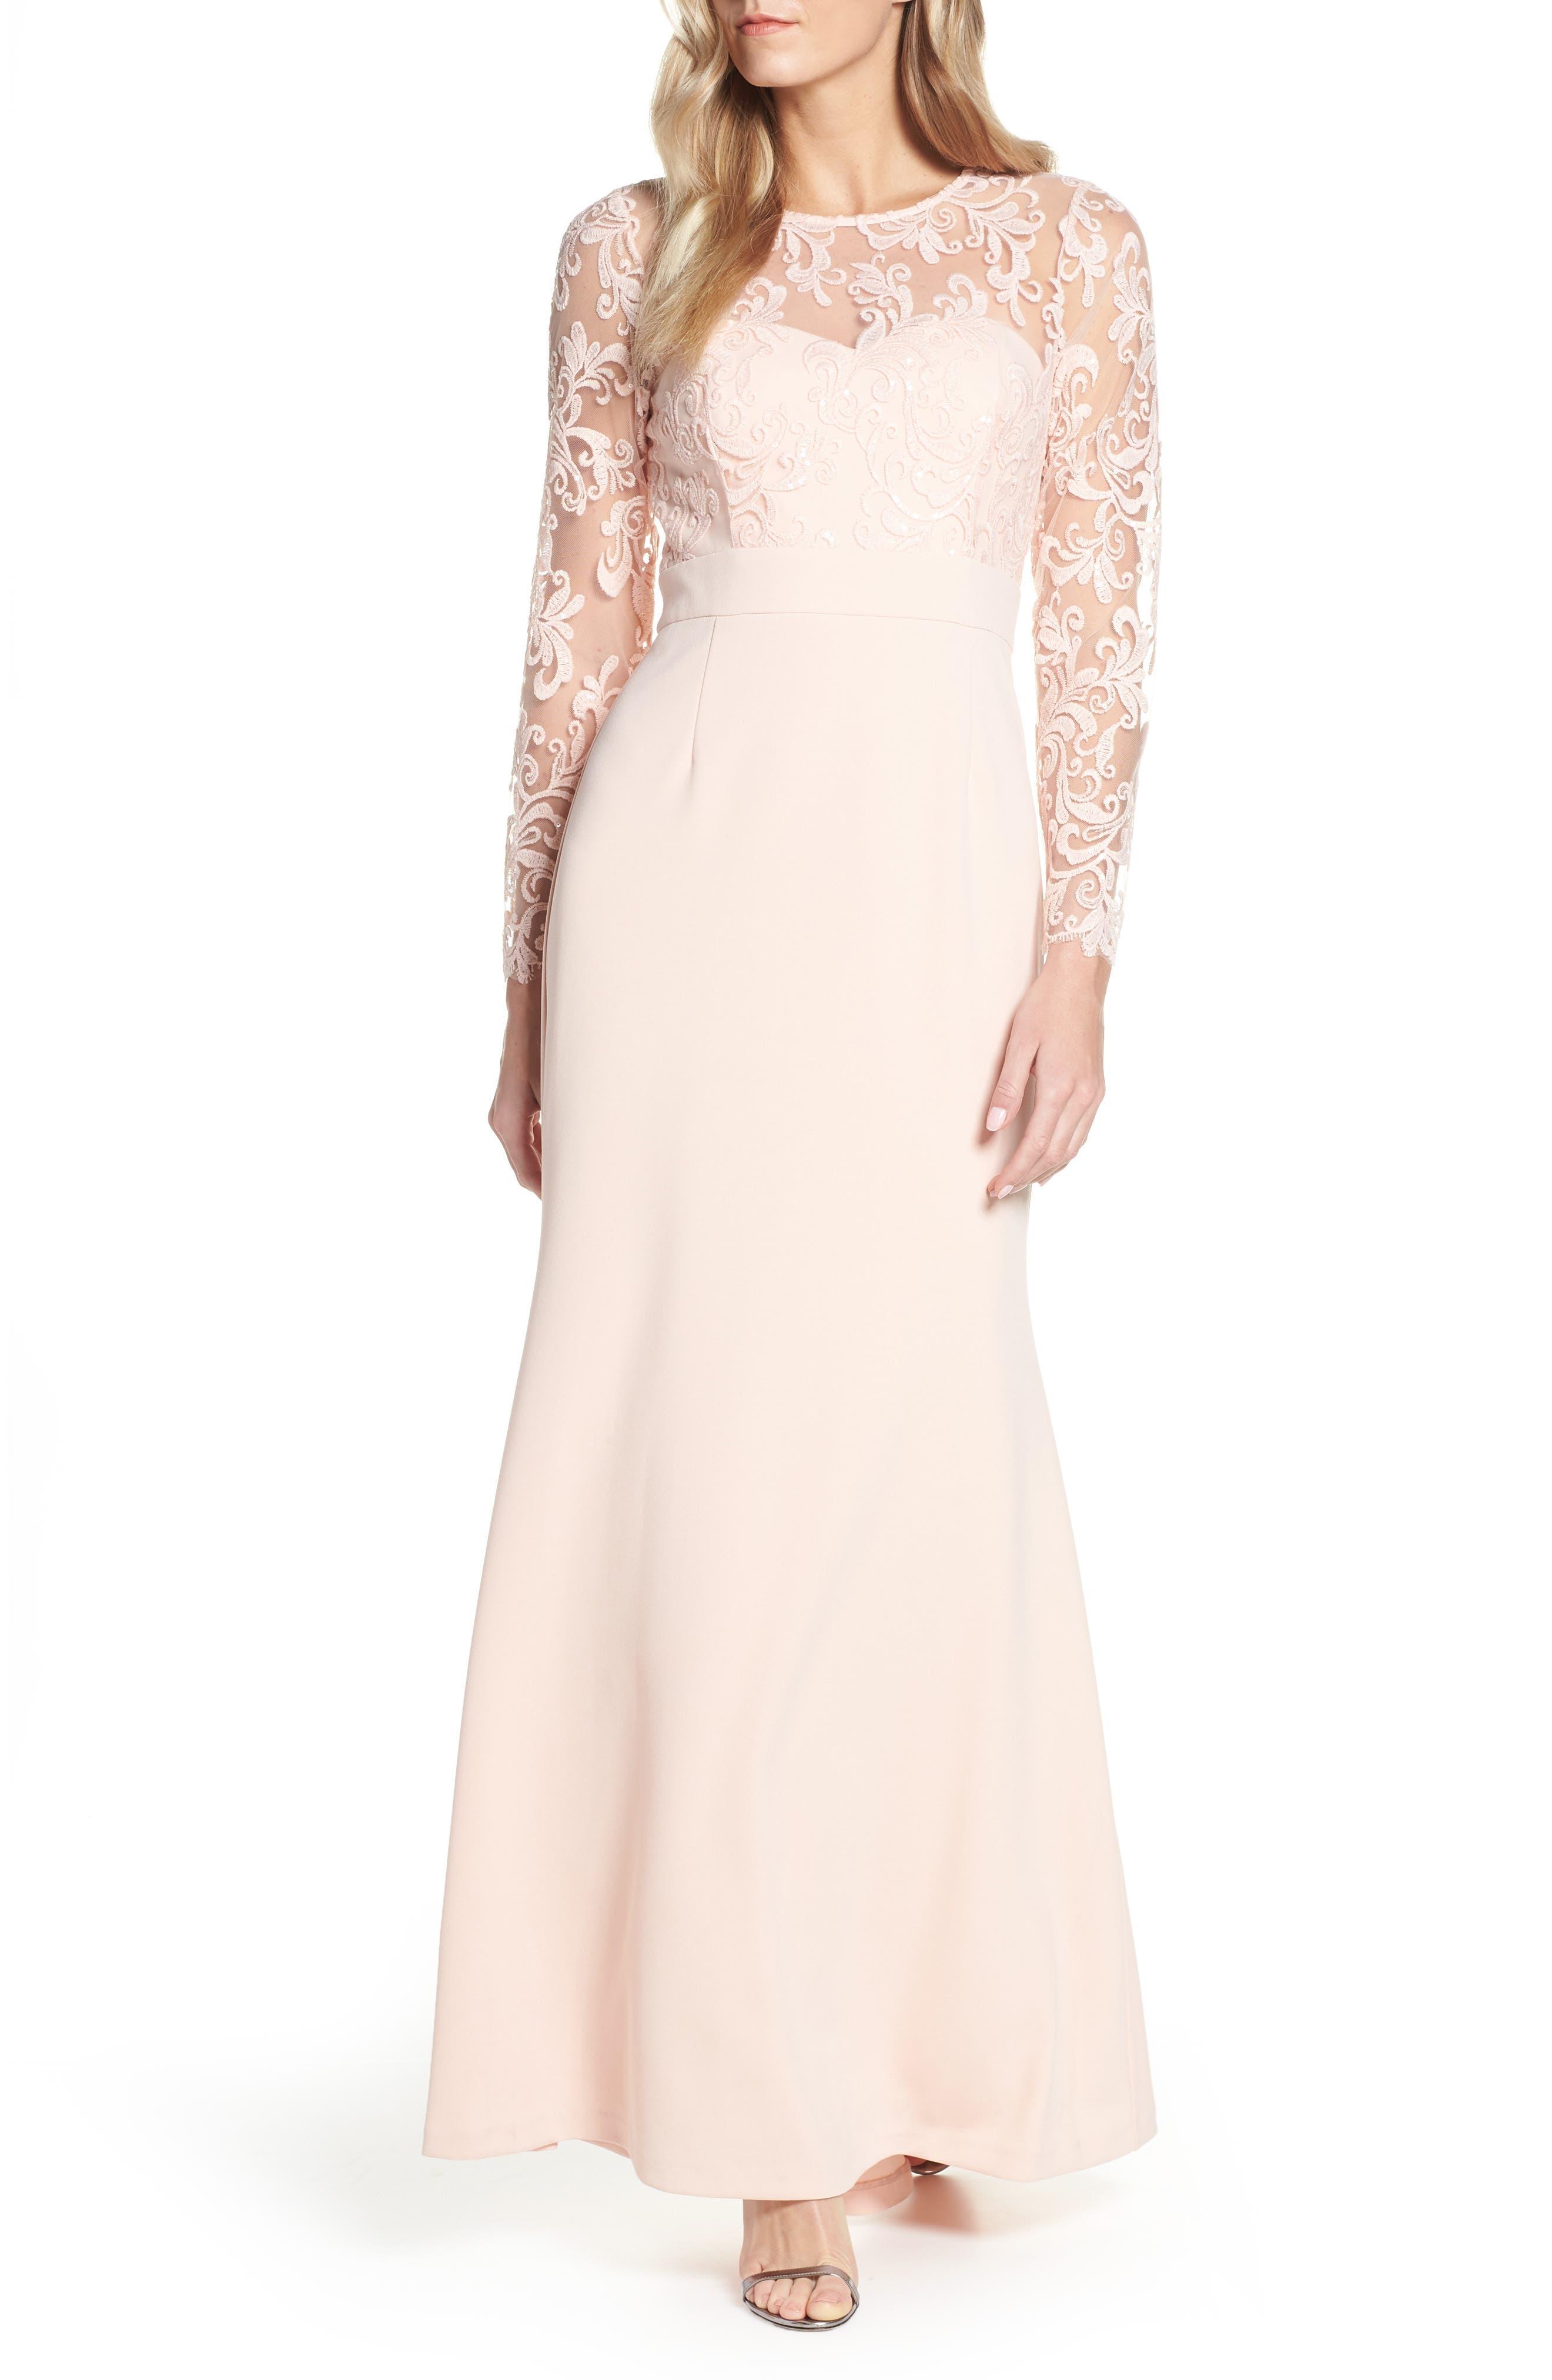 ELIZA J Embroidered Bodice Crepe Evening Dress, Main, color, BLUSH